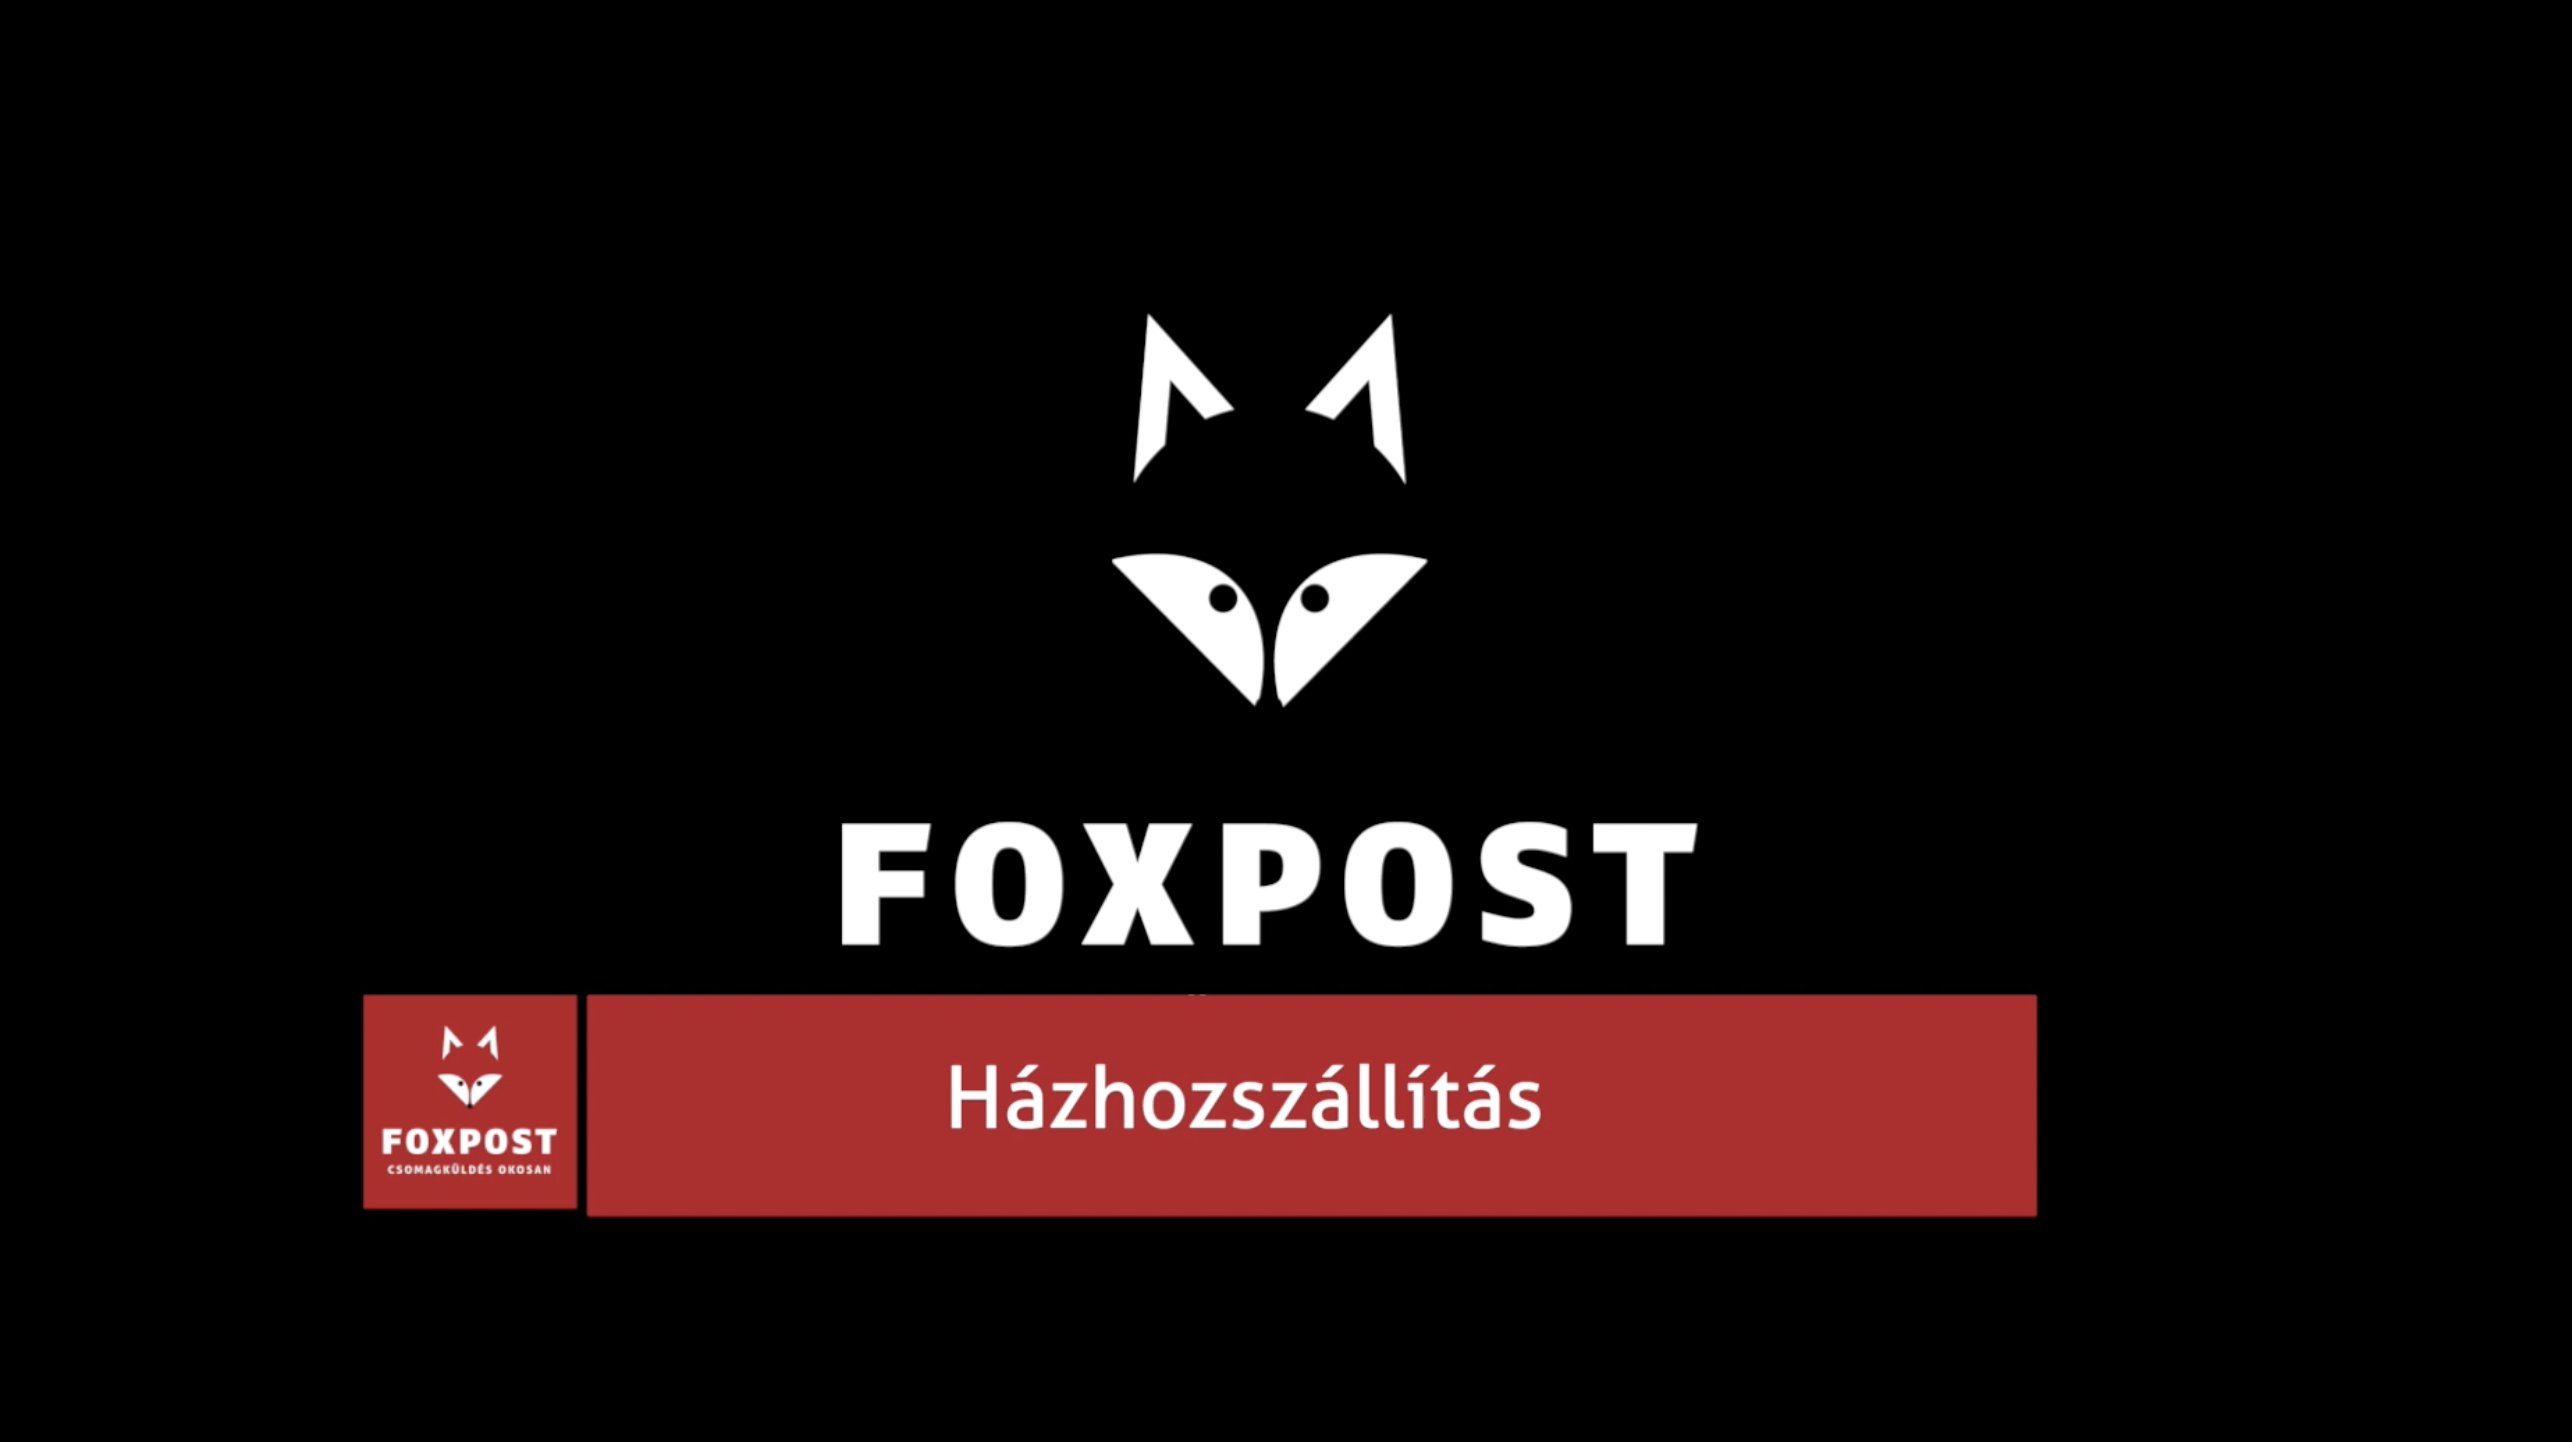 foxpost_hu_api_homedelivery